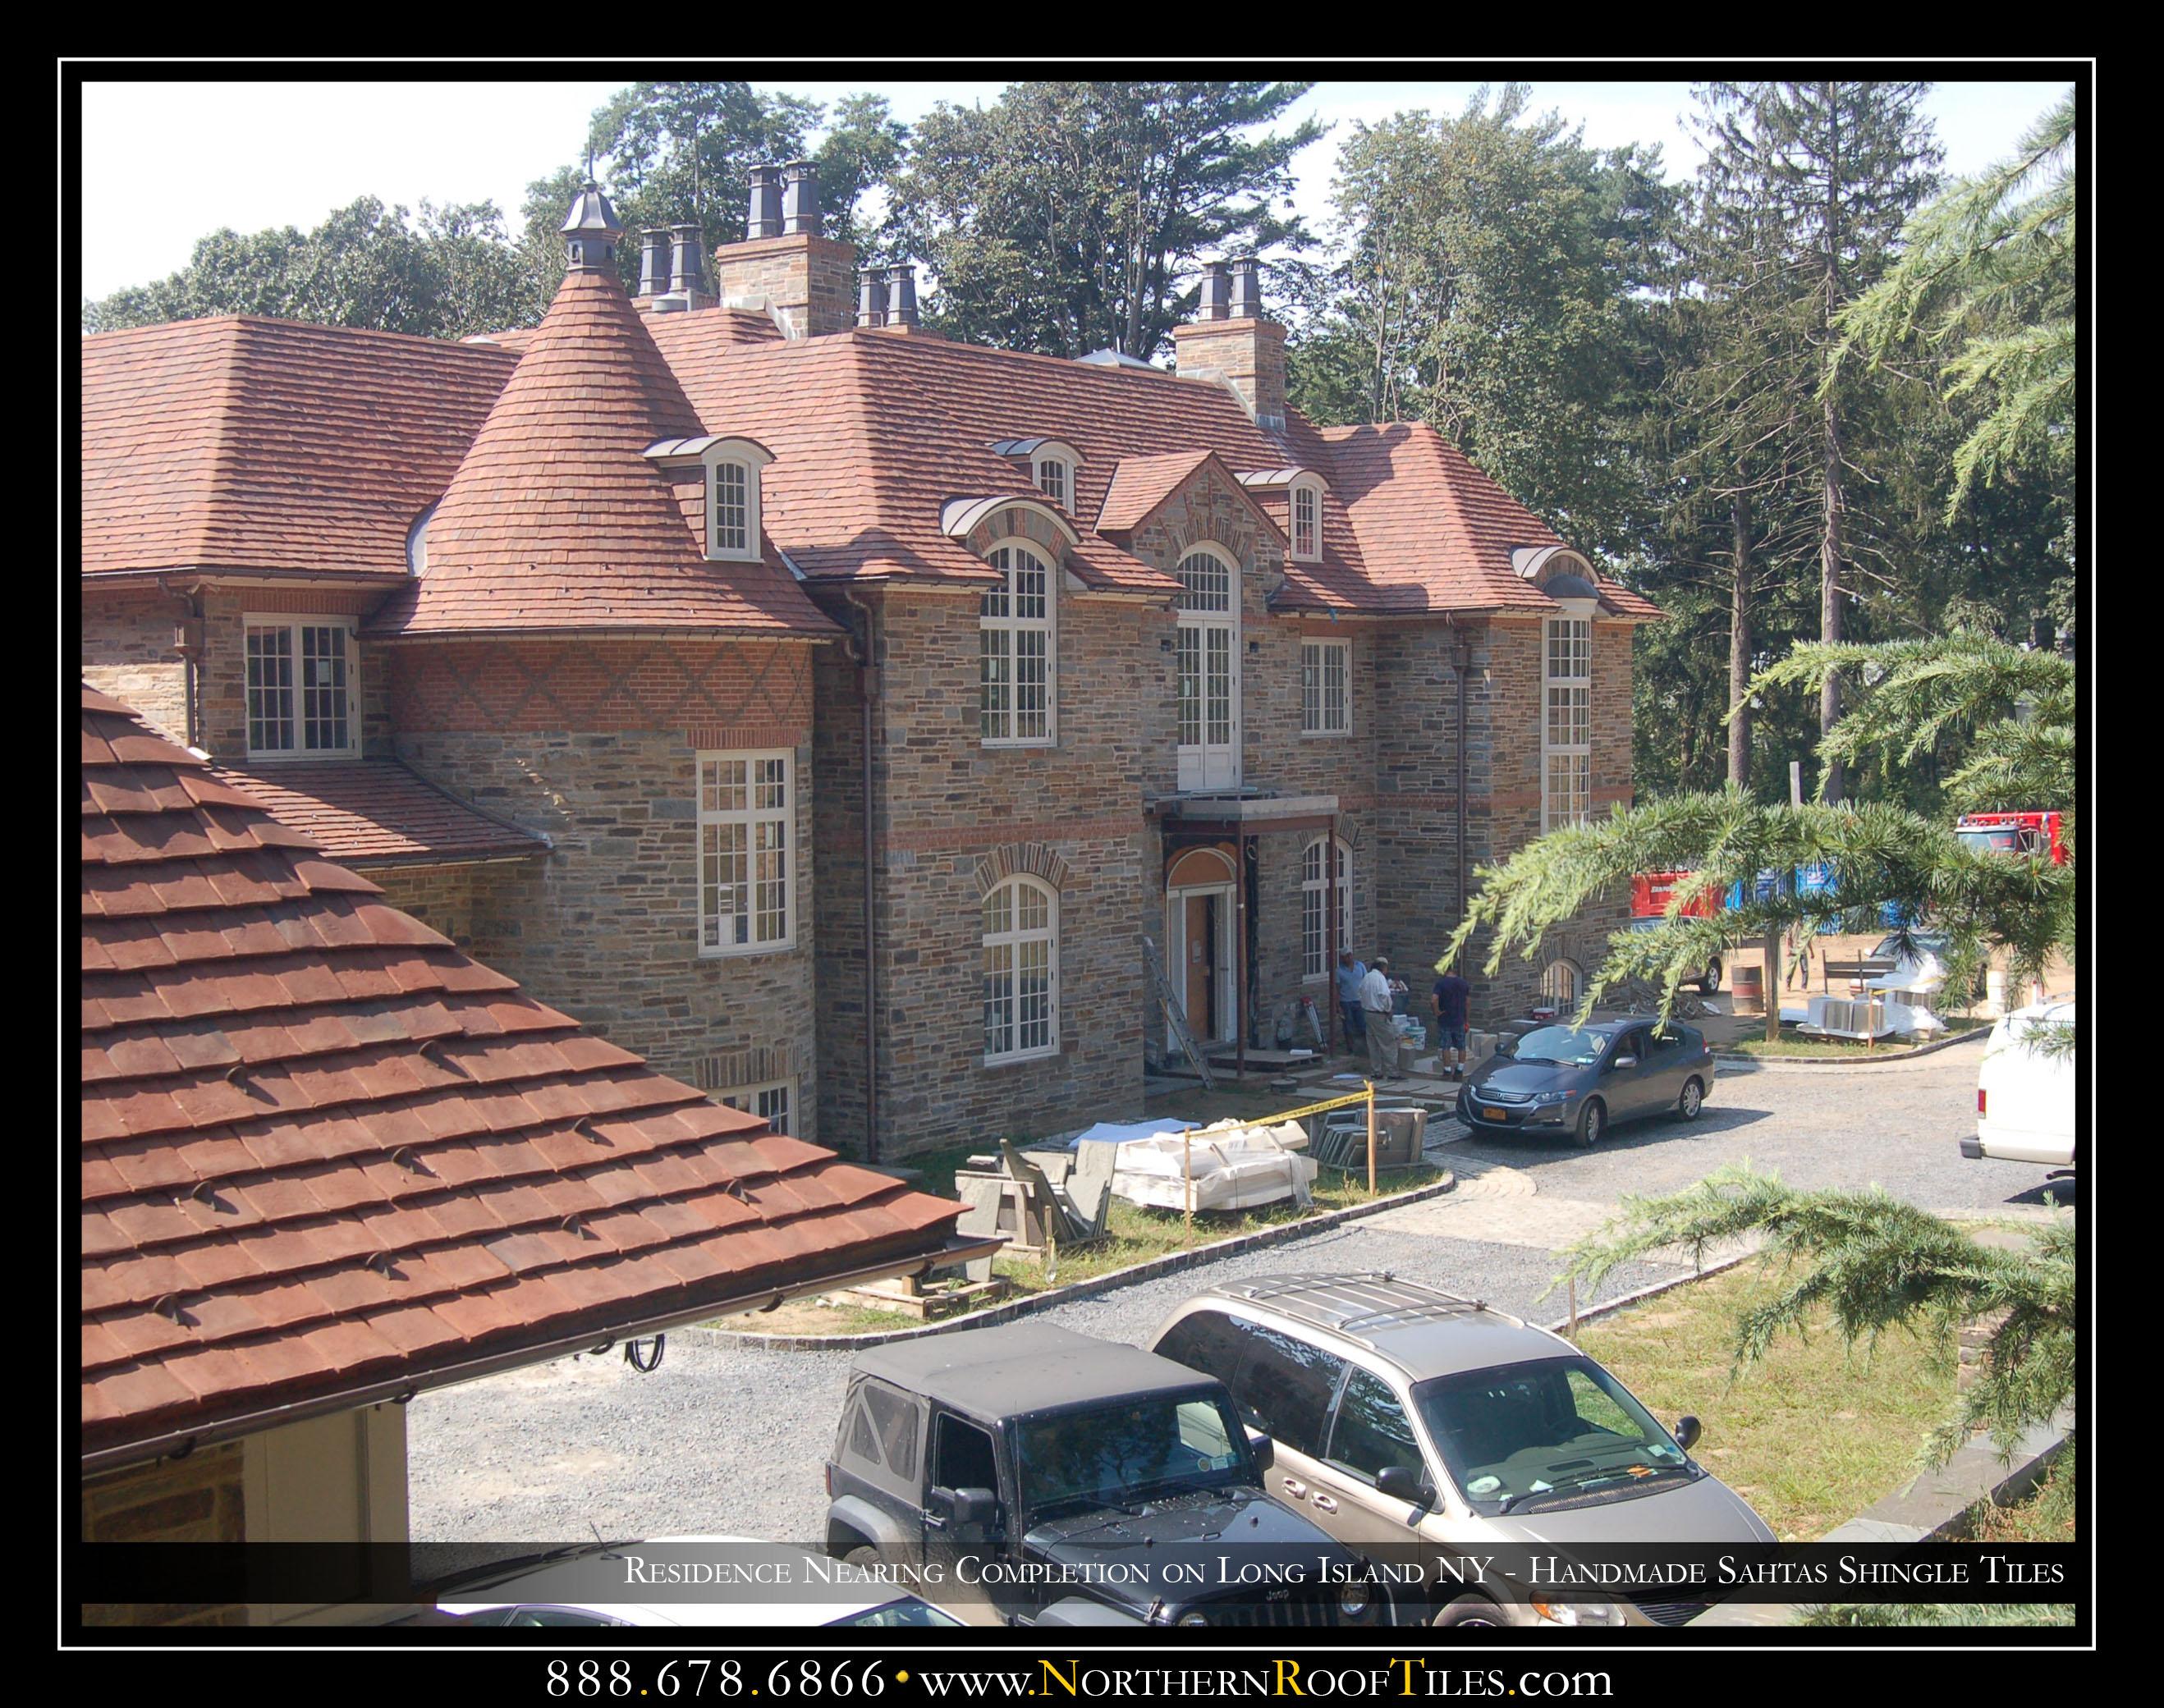 Residence Nearing Completion on Long Island NY - Handmade Shingle Tiles 1